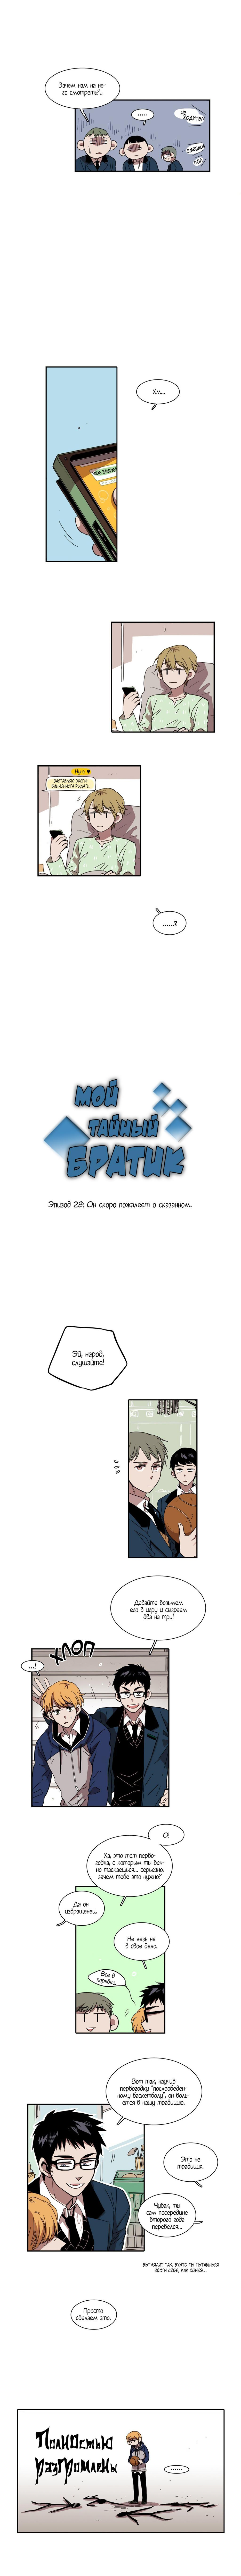 https://r1.ninemanga.com/comics/pic2/24/19800/319567/1488417339169.jpg Page 3